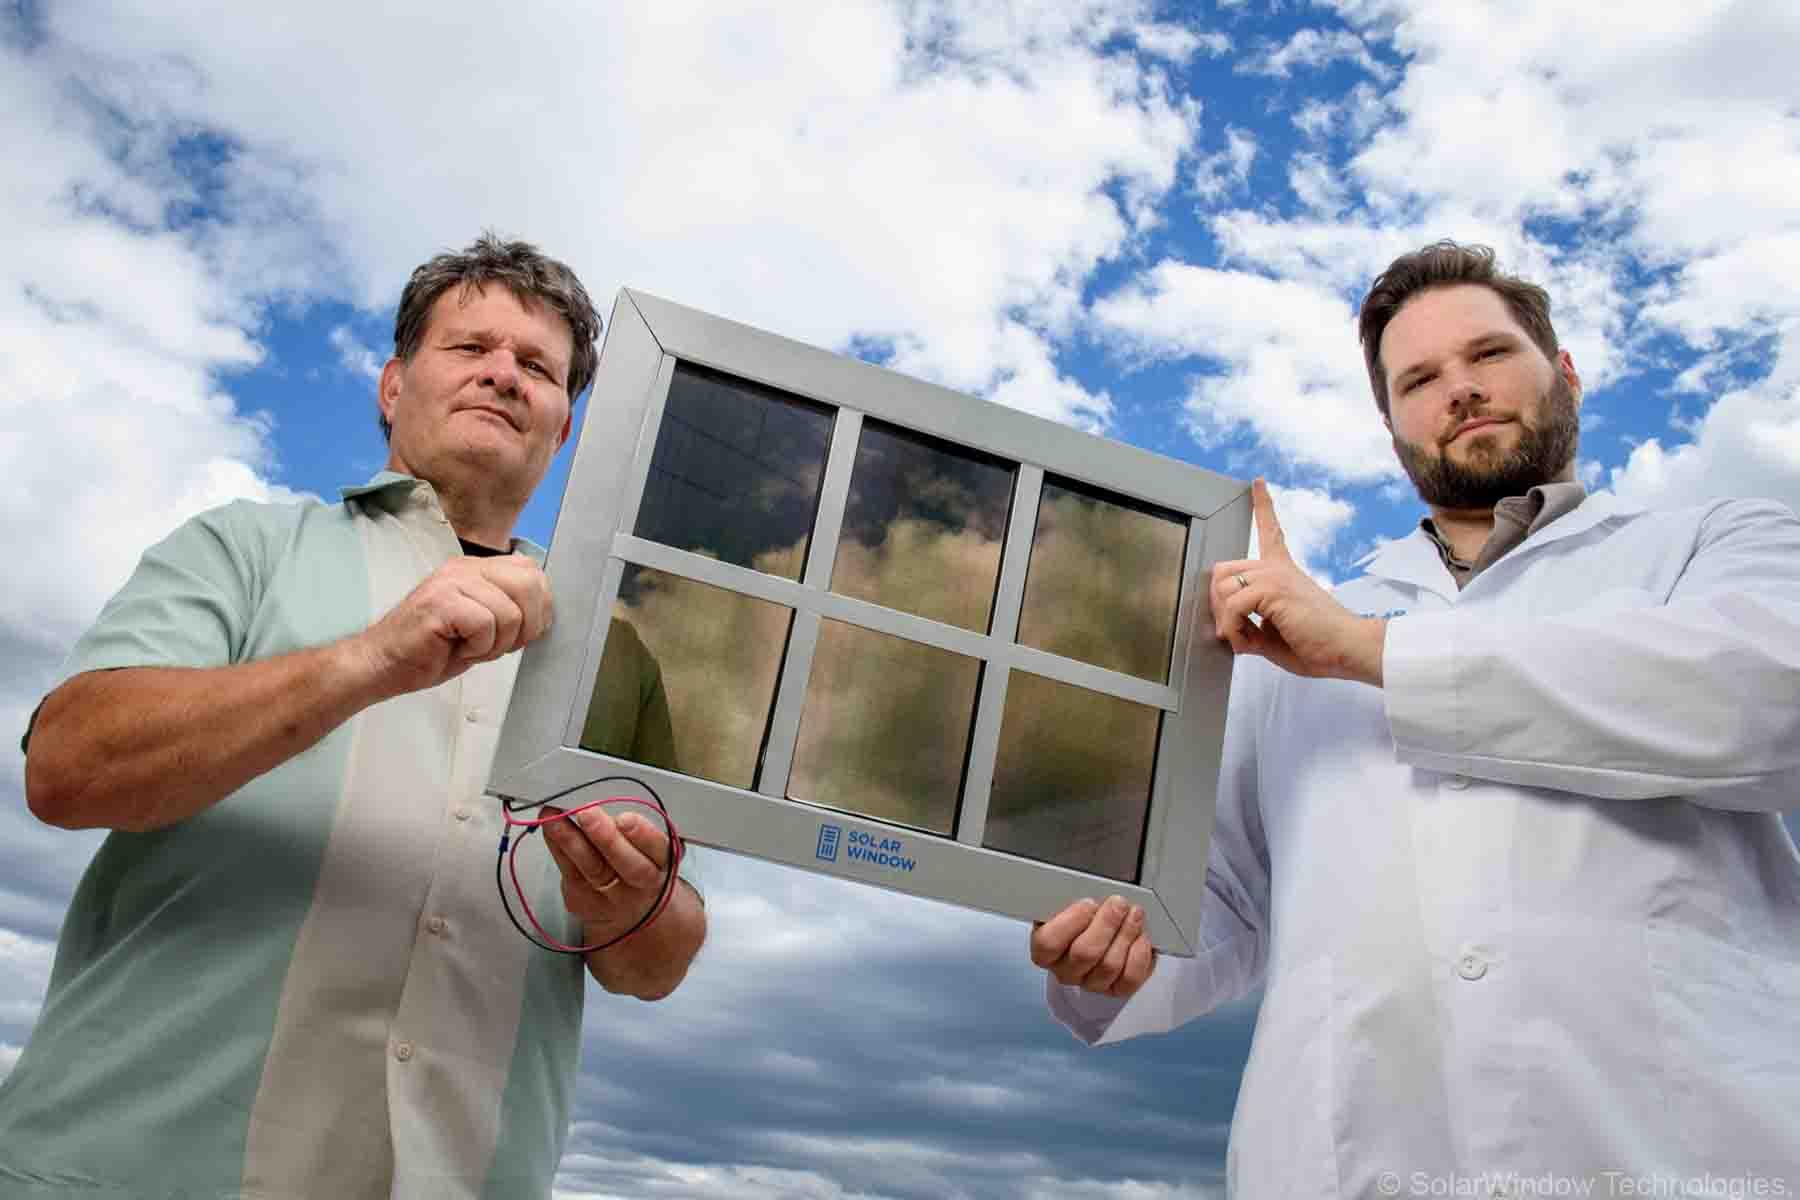 SolarWindow electricity-generating window model